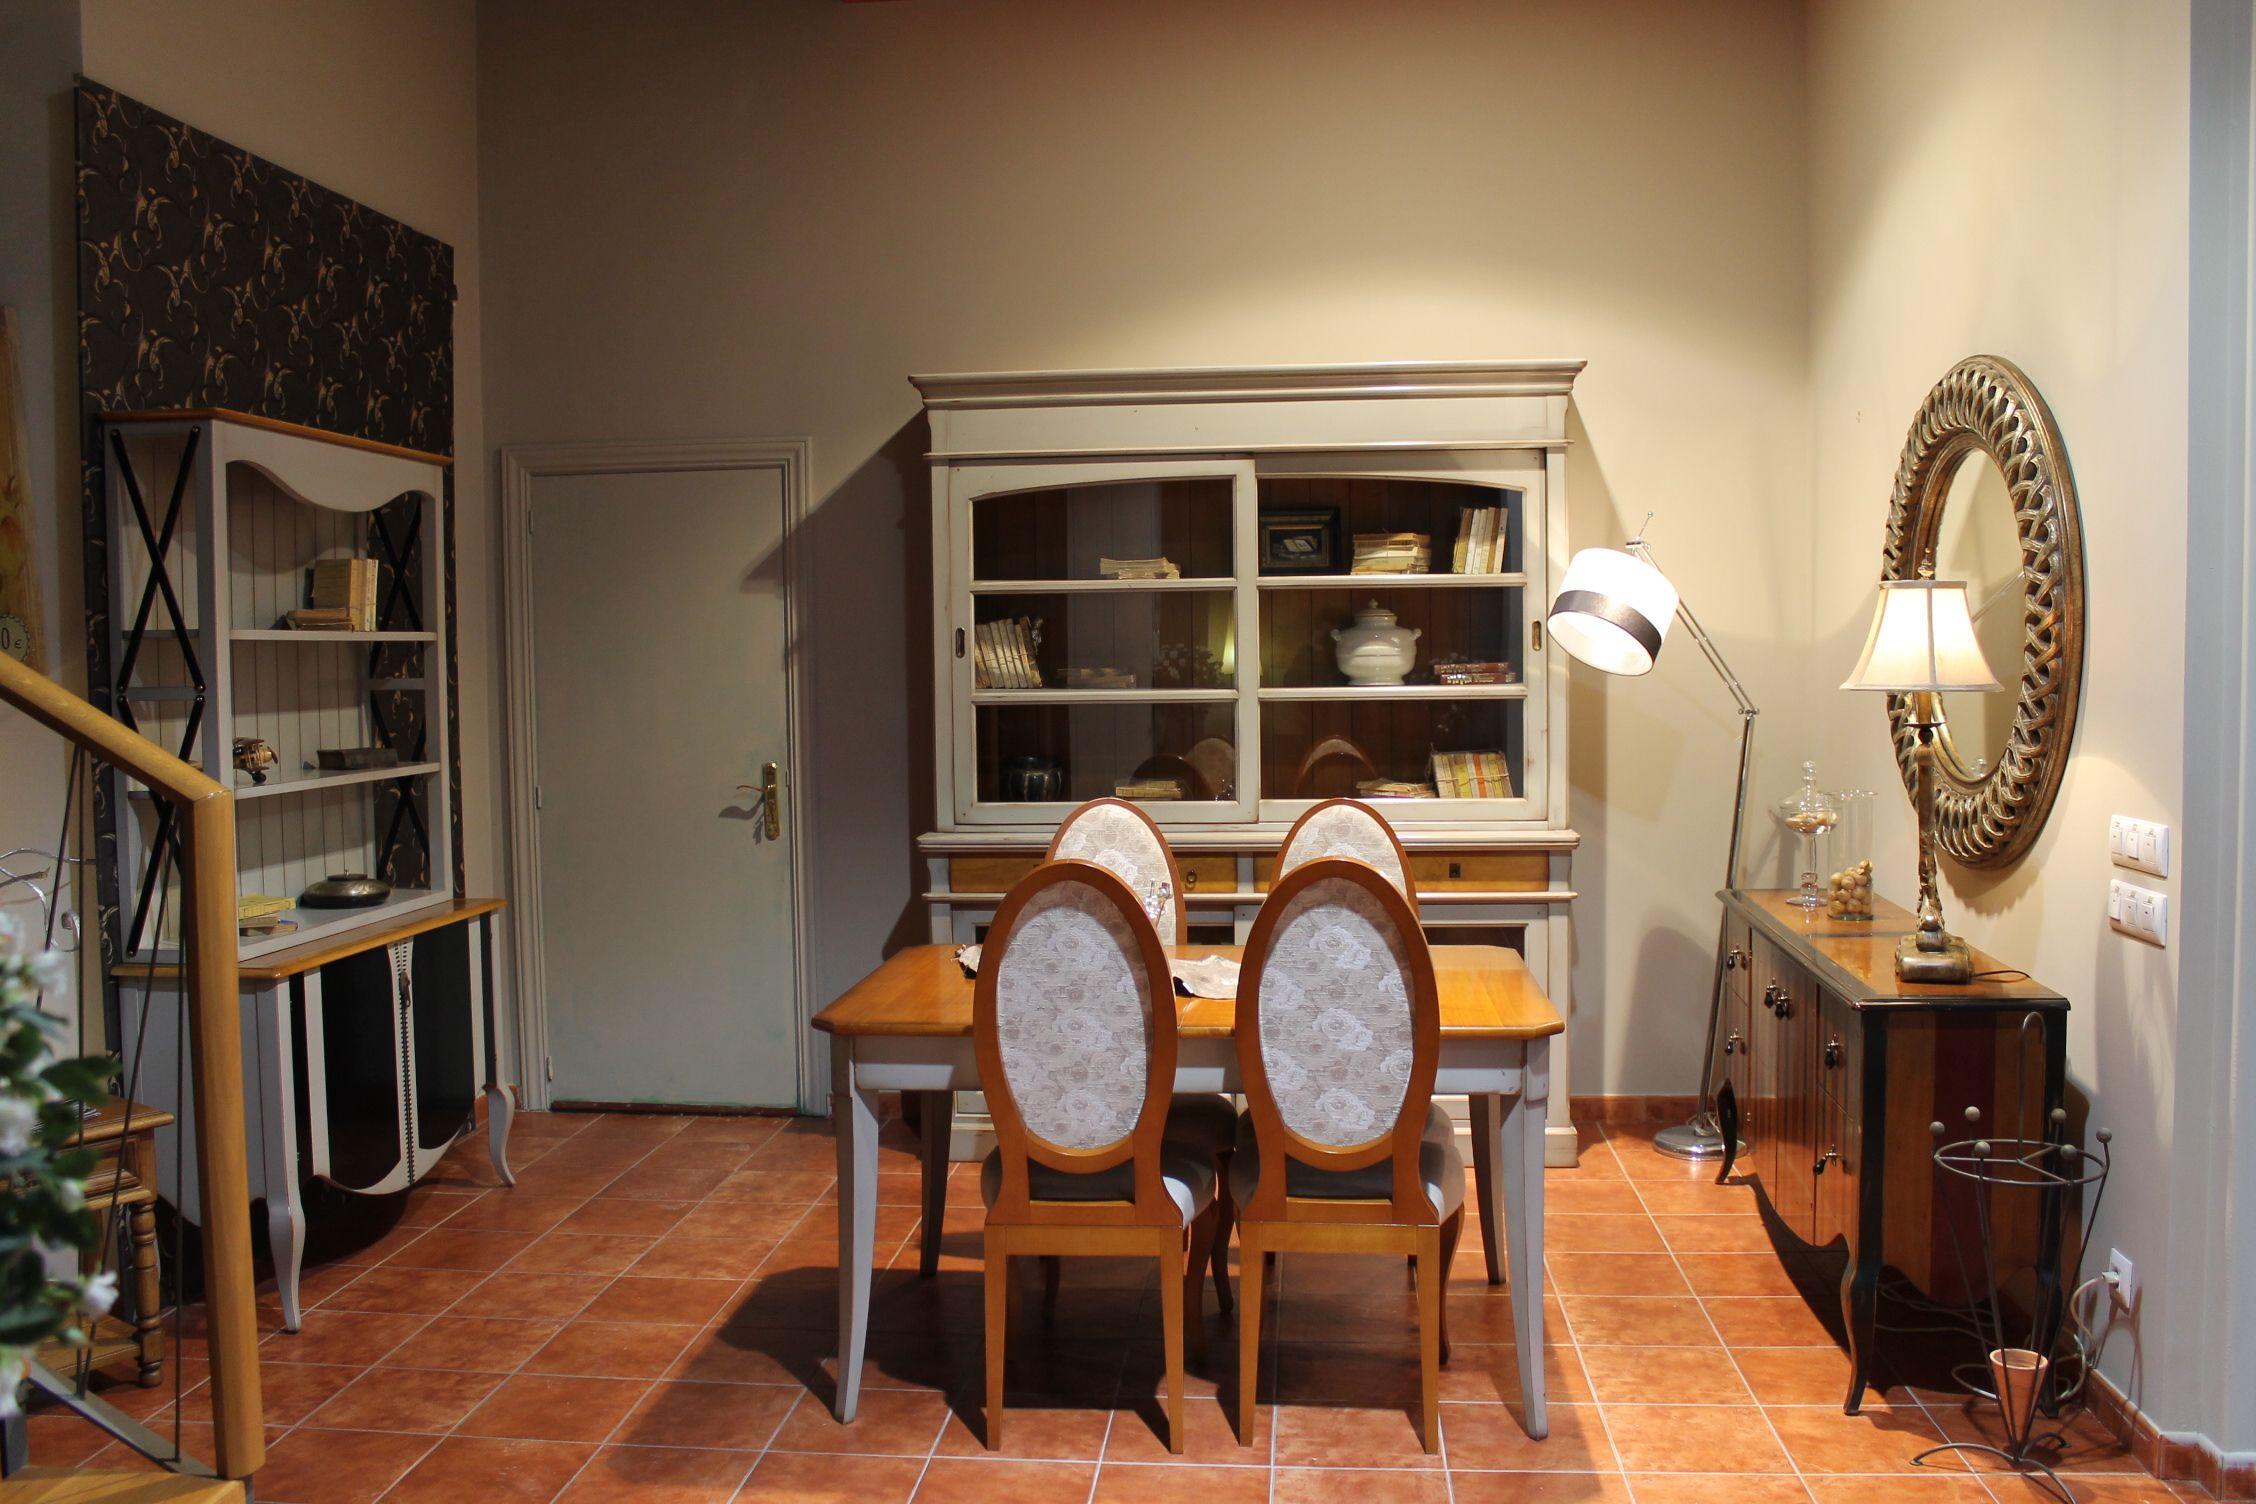 Ambiente de salon comedor clasico modelo opera icono interiorismo - Salon comedor clasico ...